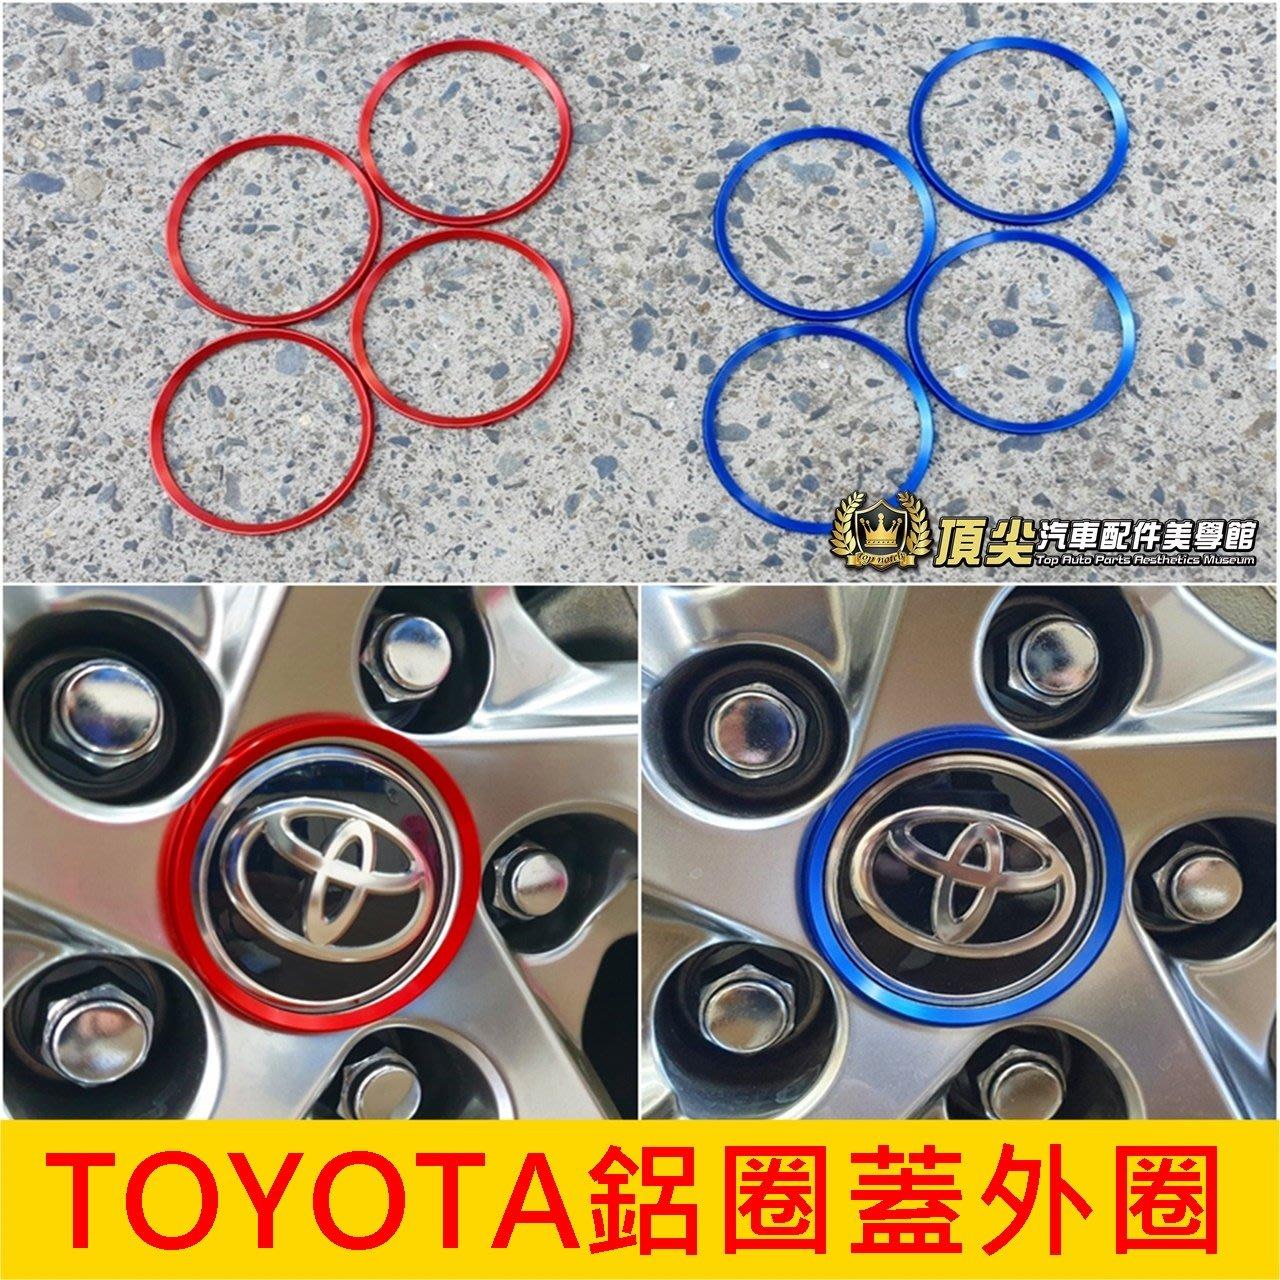 TOYOTA豐田【CROSS鋁圈蓋外圈】紅色 藍色 COROLLA CC鋁圈蓋裝飾 鋁合金 輪框中心圓蓋 輪胎 配件改裝